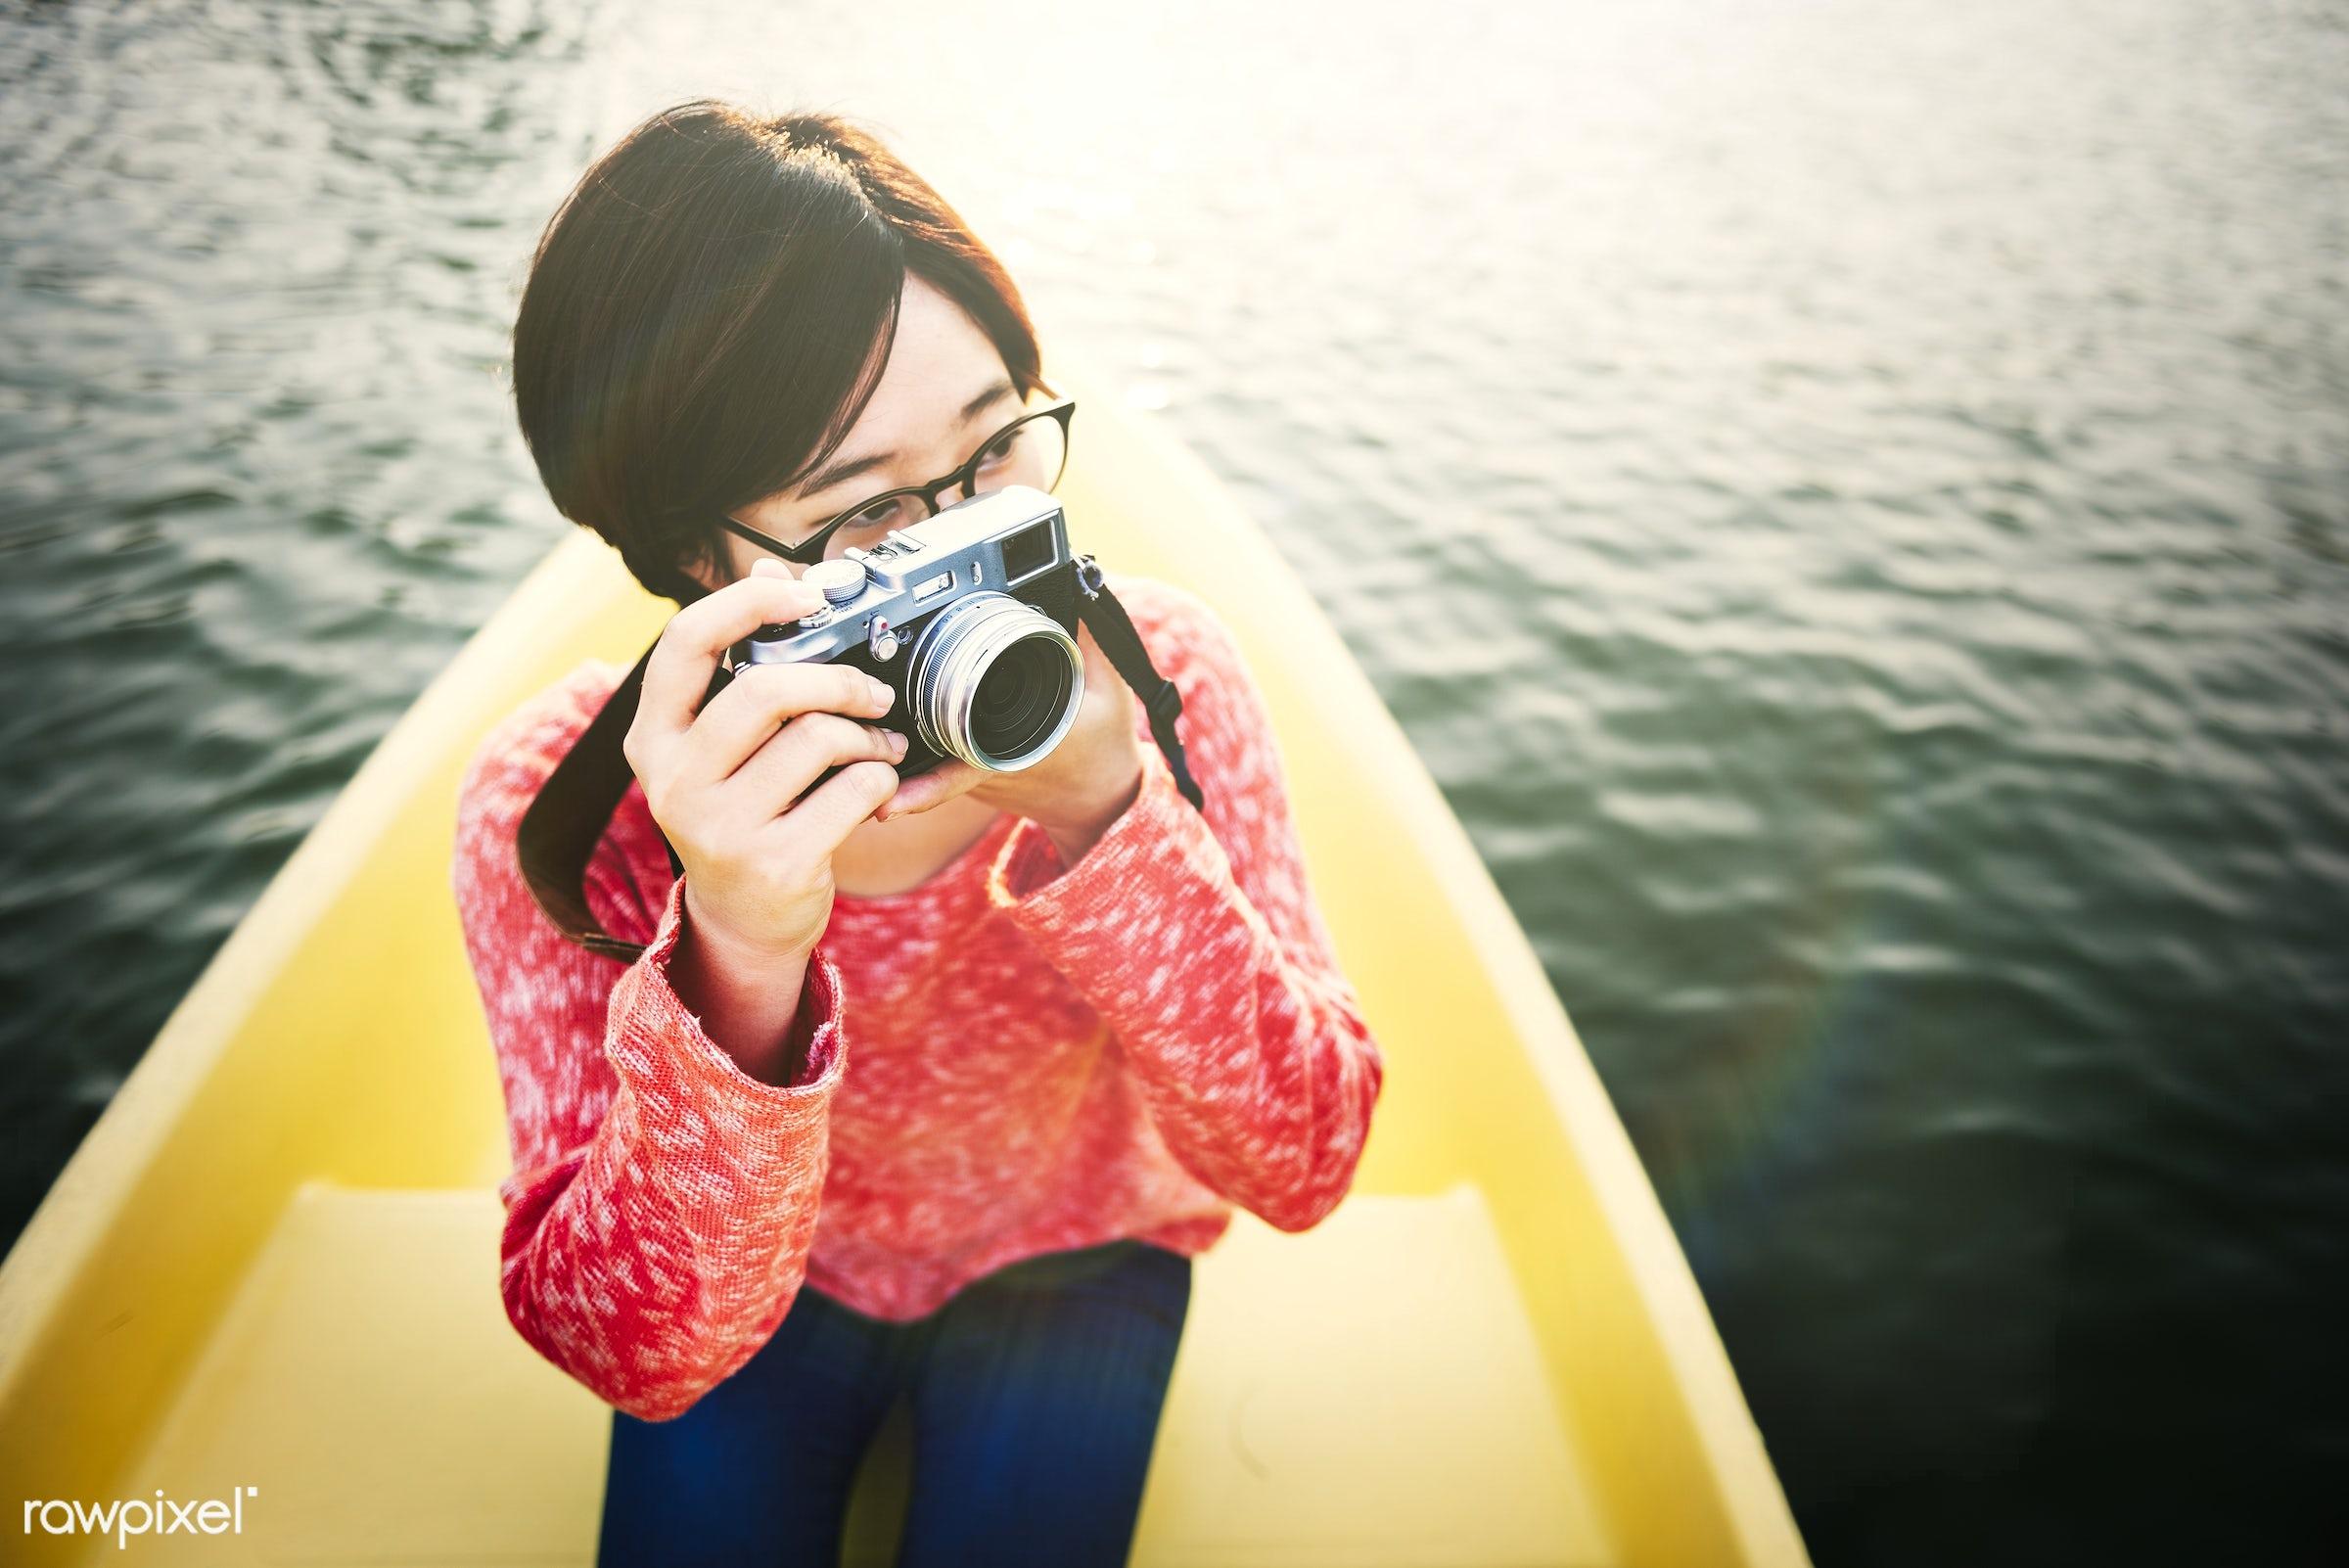 kayak, activity, adventure, beautiful, boat, camera, canoe, canoeing, casual, destination, enjoyment, freedom, fun, girl,...